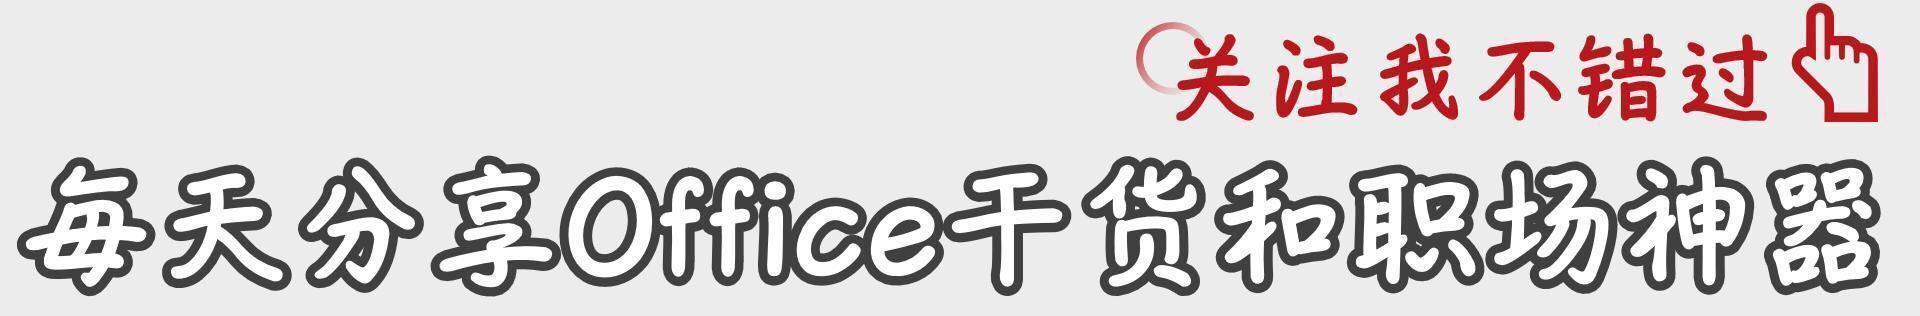 f7984c744c8be175cedac1cd7d2d8e46.png